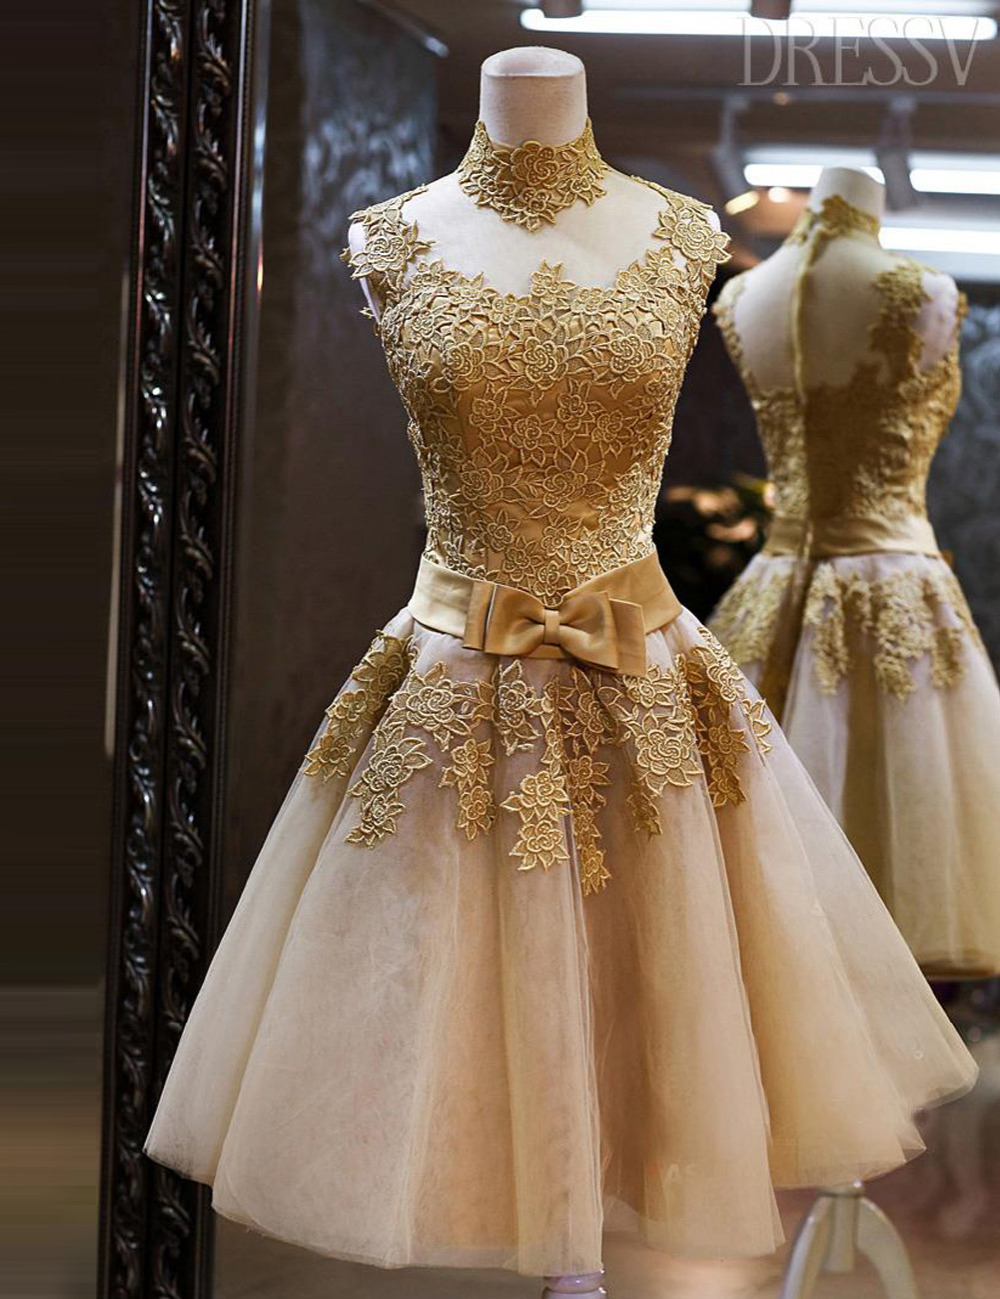 Fullsize Of 8th Grade Graduation Dresses